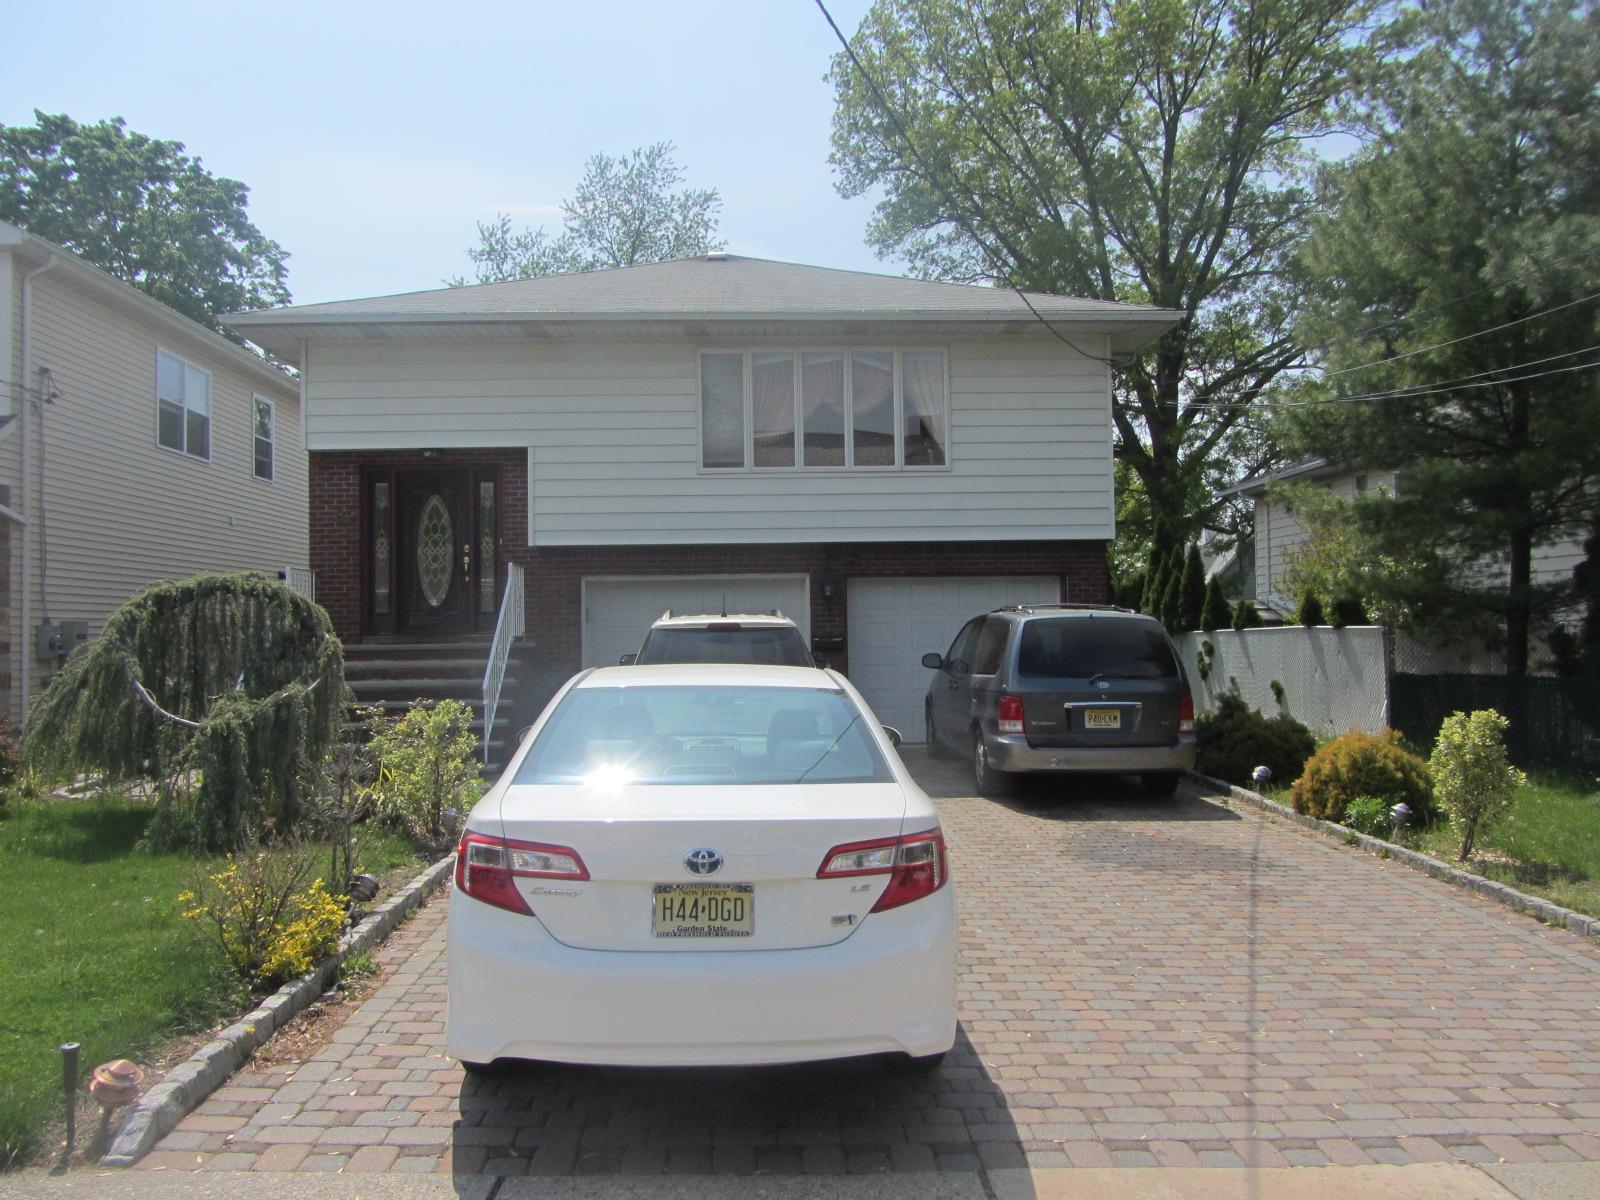 80 Florence pl, Elmwood Park, New Jersey 07407